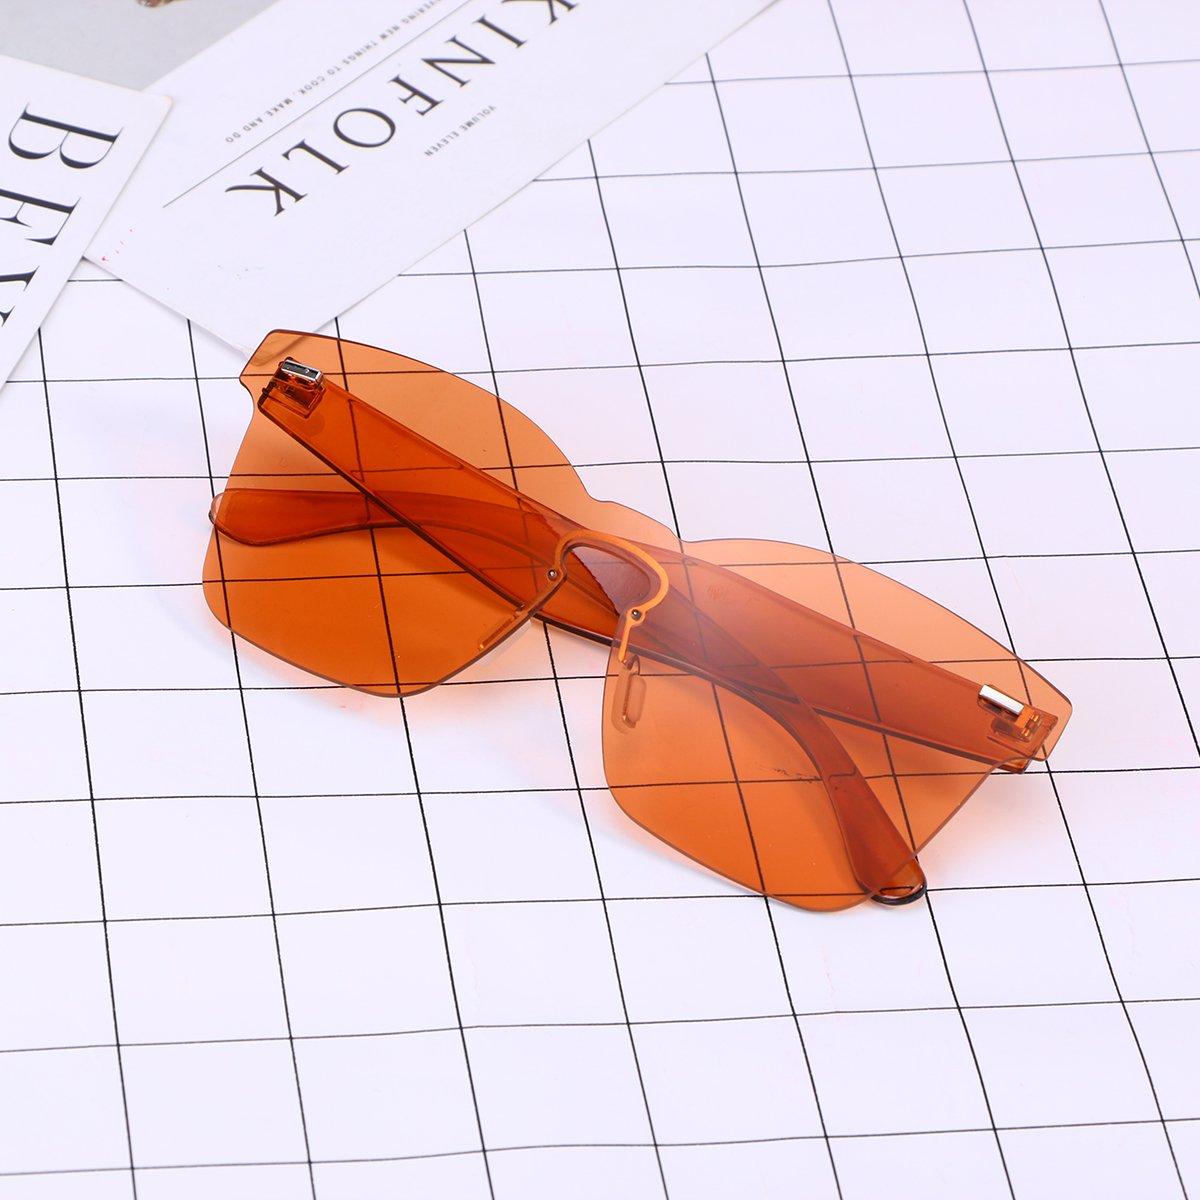 15f2be72a7f6 OULII Rimless Sunglasses Novelty Pratical Beach Seaside Sunglass Mirror  Summer Eyewear for Men Women (Orange): Amazon.com.au: Fashion